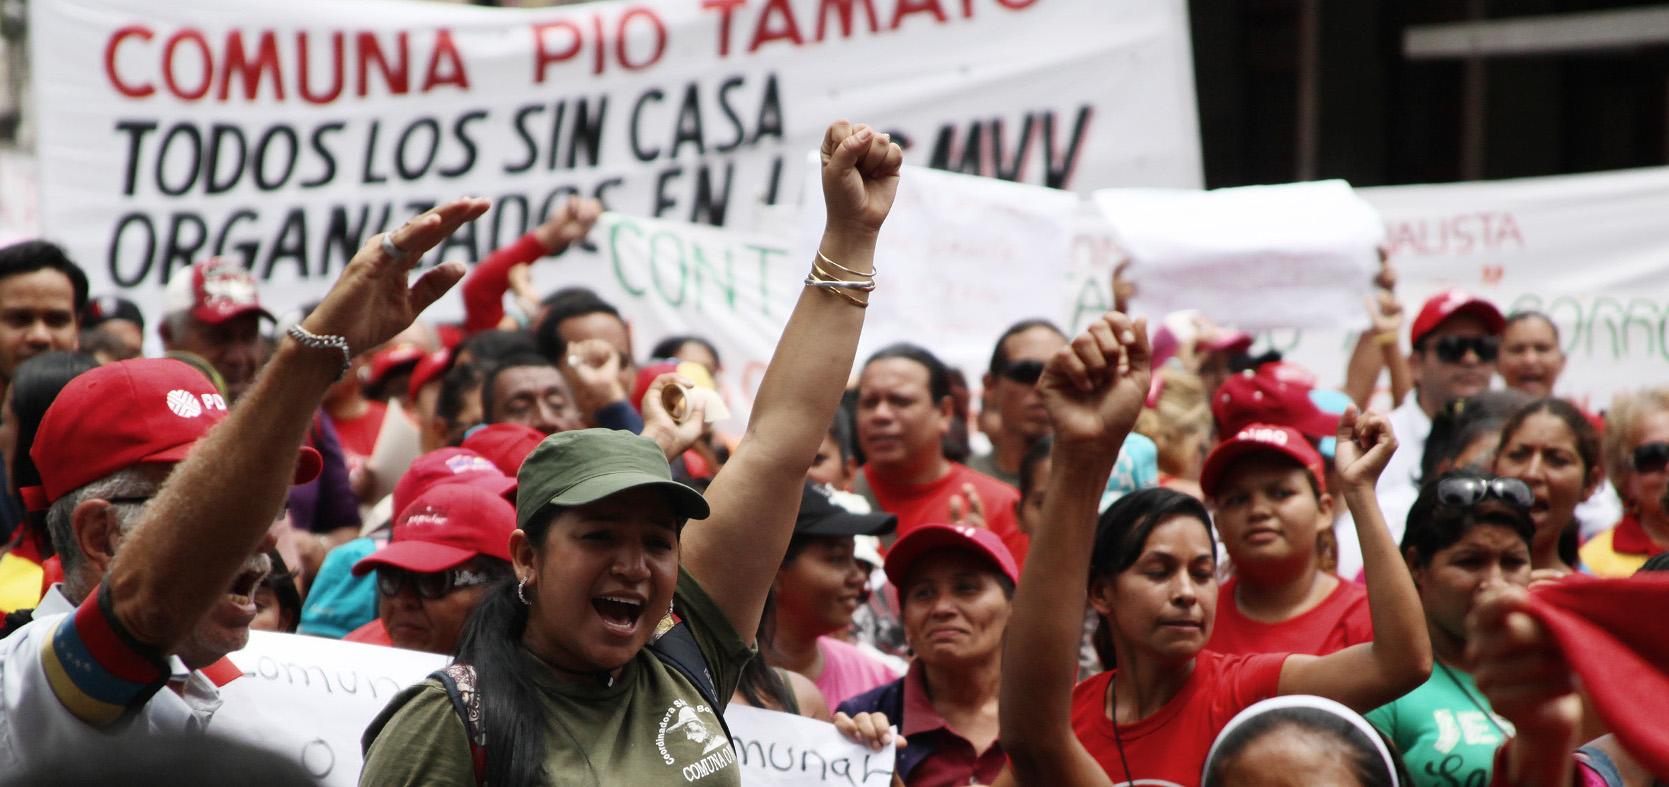 The Communal State: Maduro's Inherited Social Control Machine